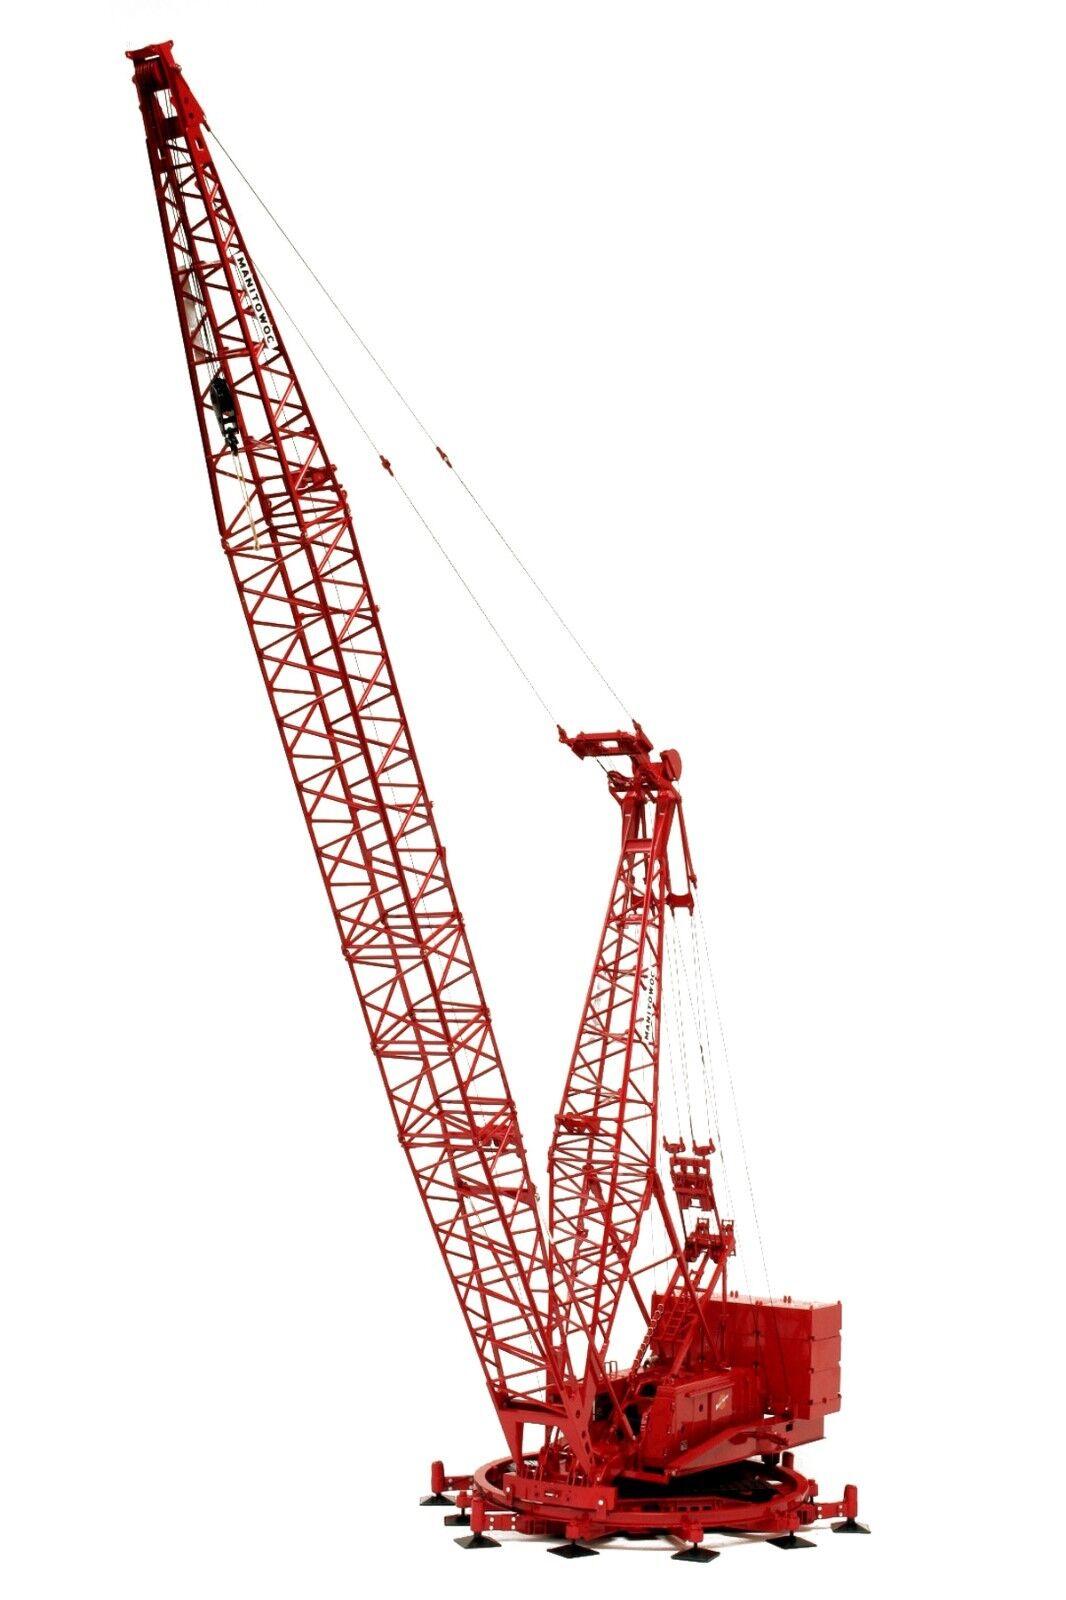 Manitowoc 4100W Ringer Crane - 1 50 - TWH